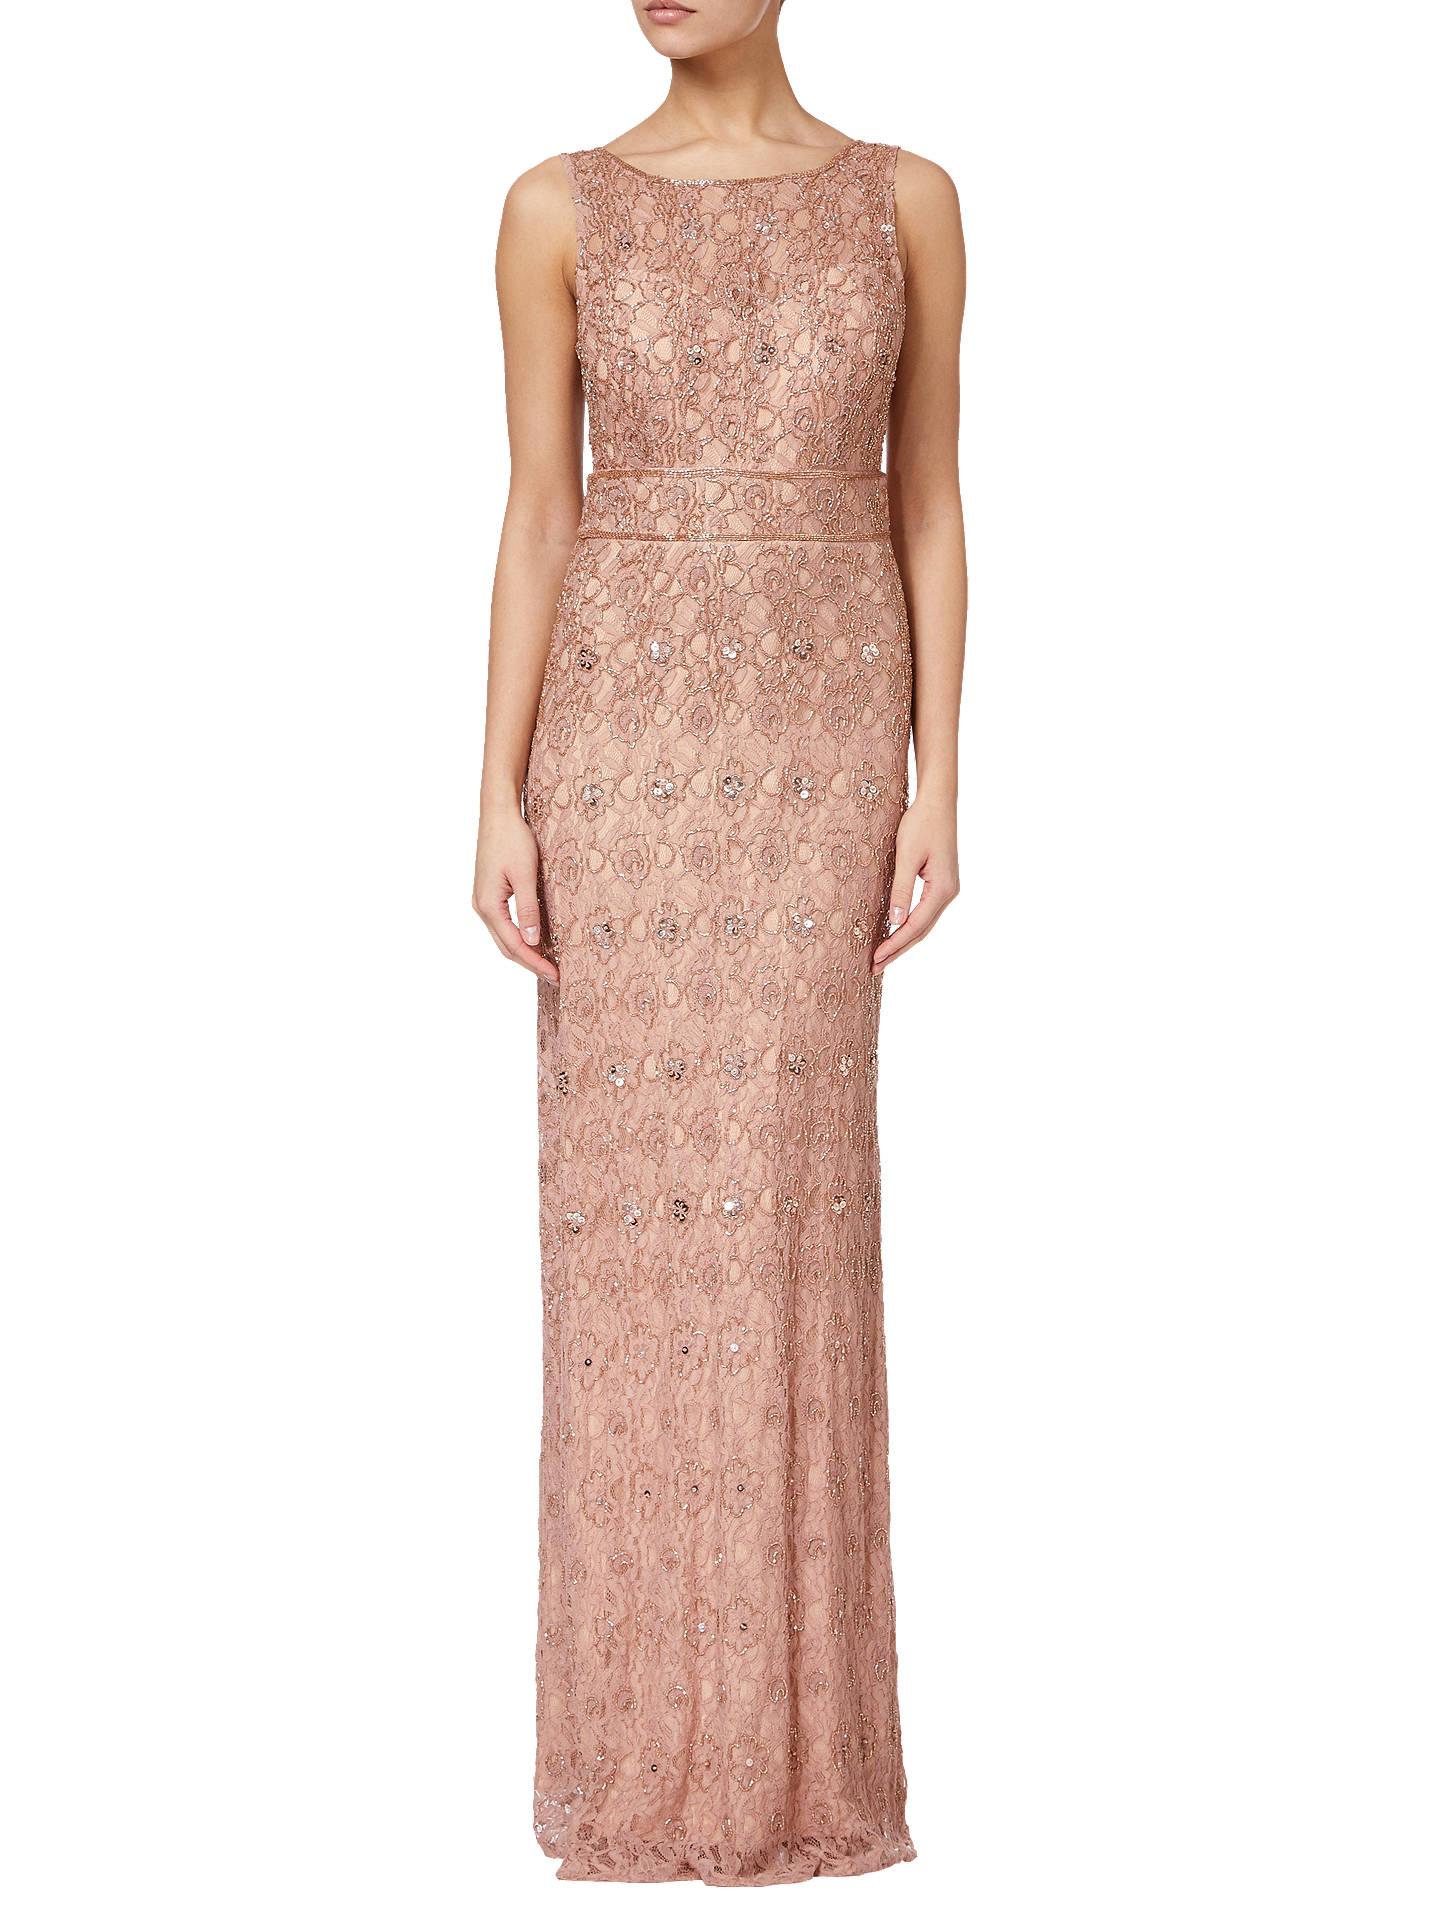 Adrianna Papell Beaded V-Back Long Dress, Rose Gold at John Lewis ...